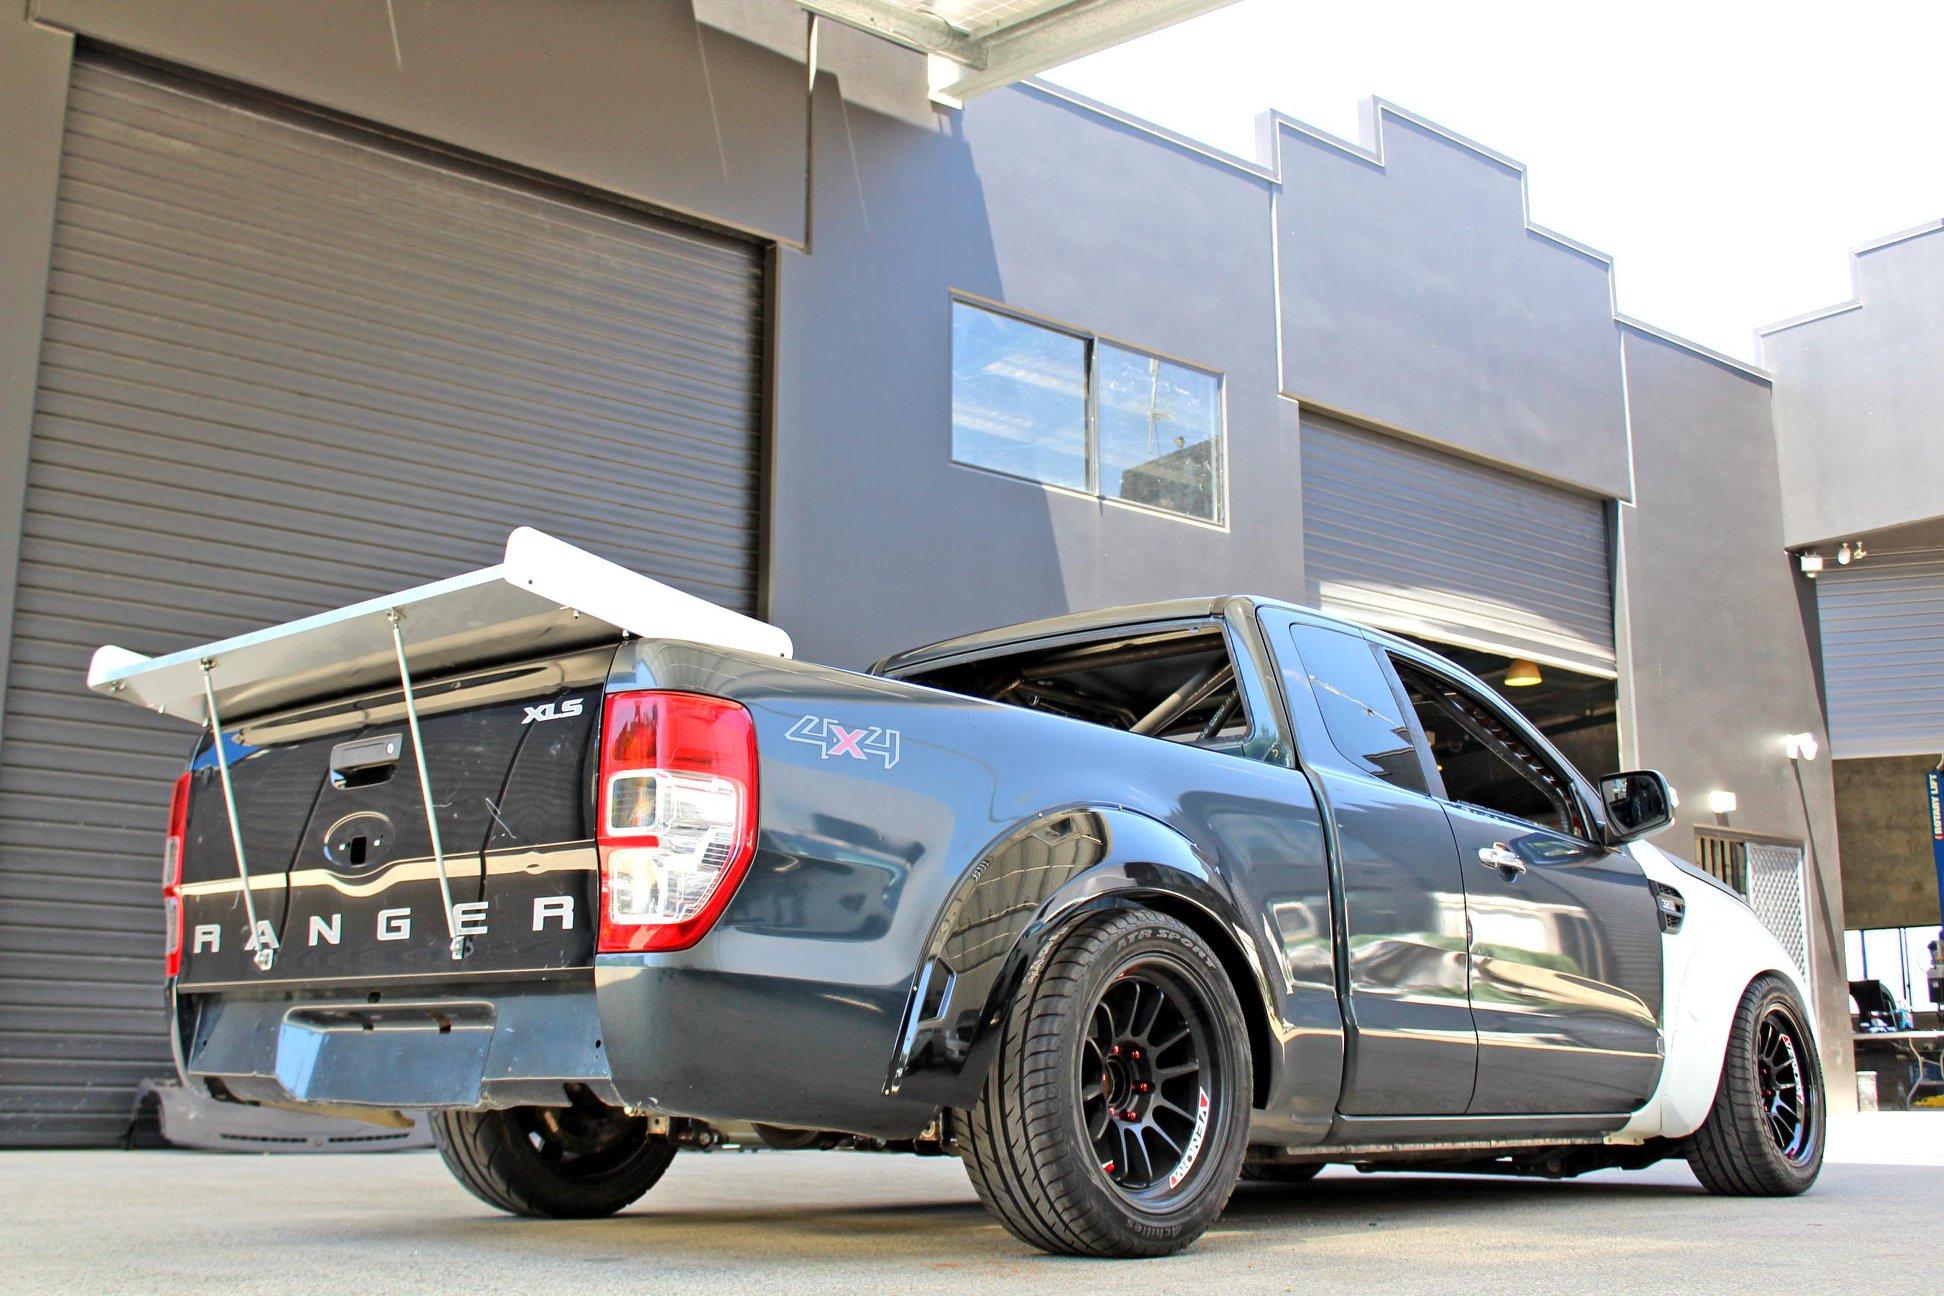 Ford Ranger Rear End Width